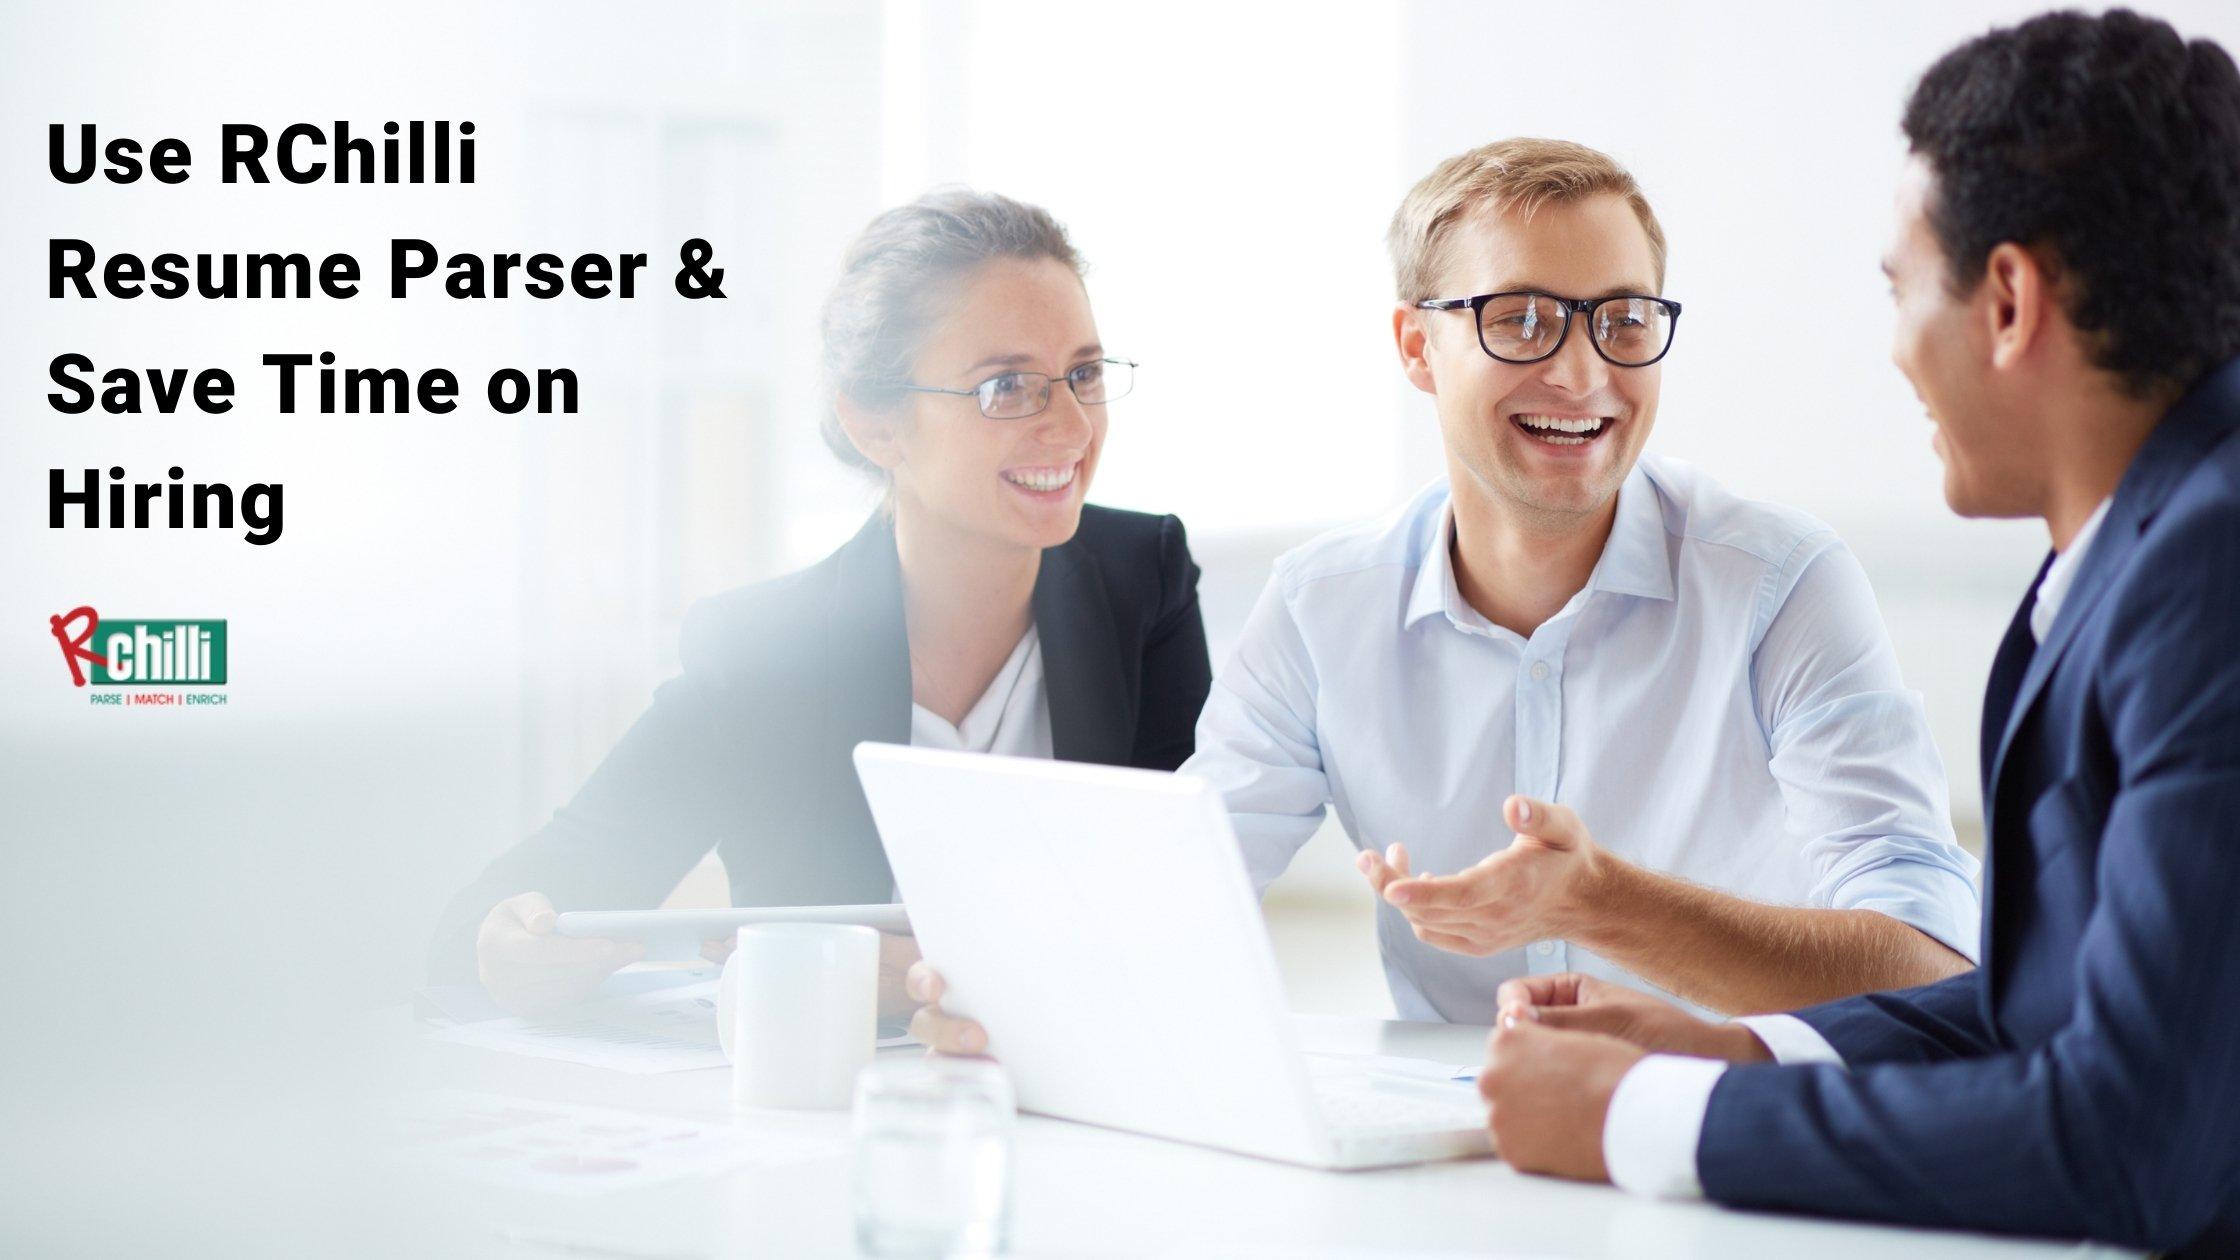 Use RChilli resume parser & save time on hiring.